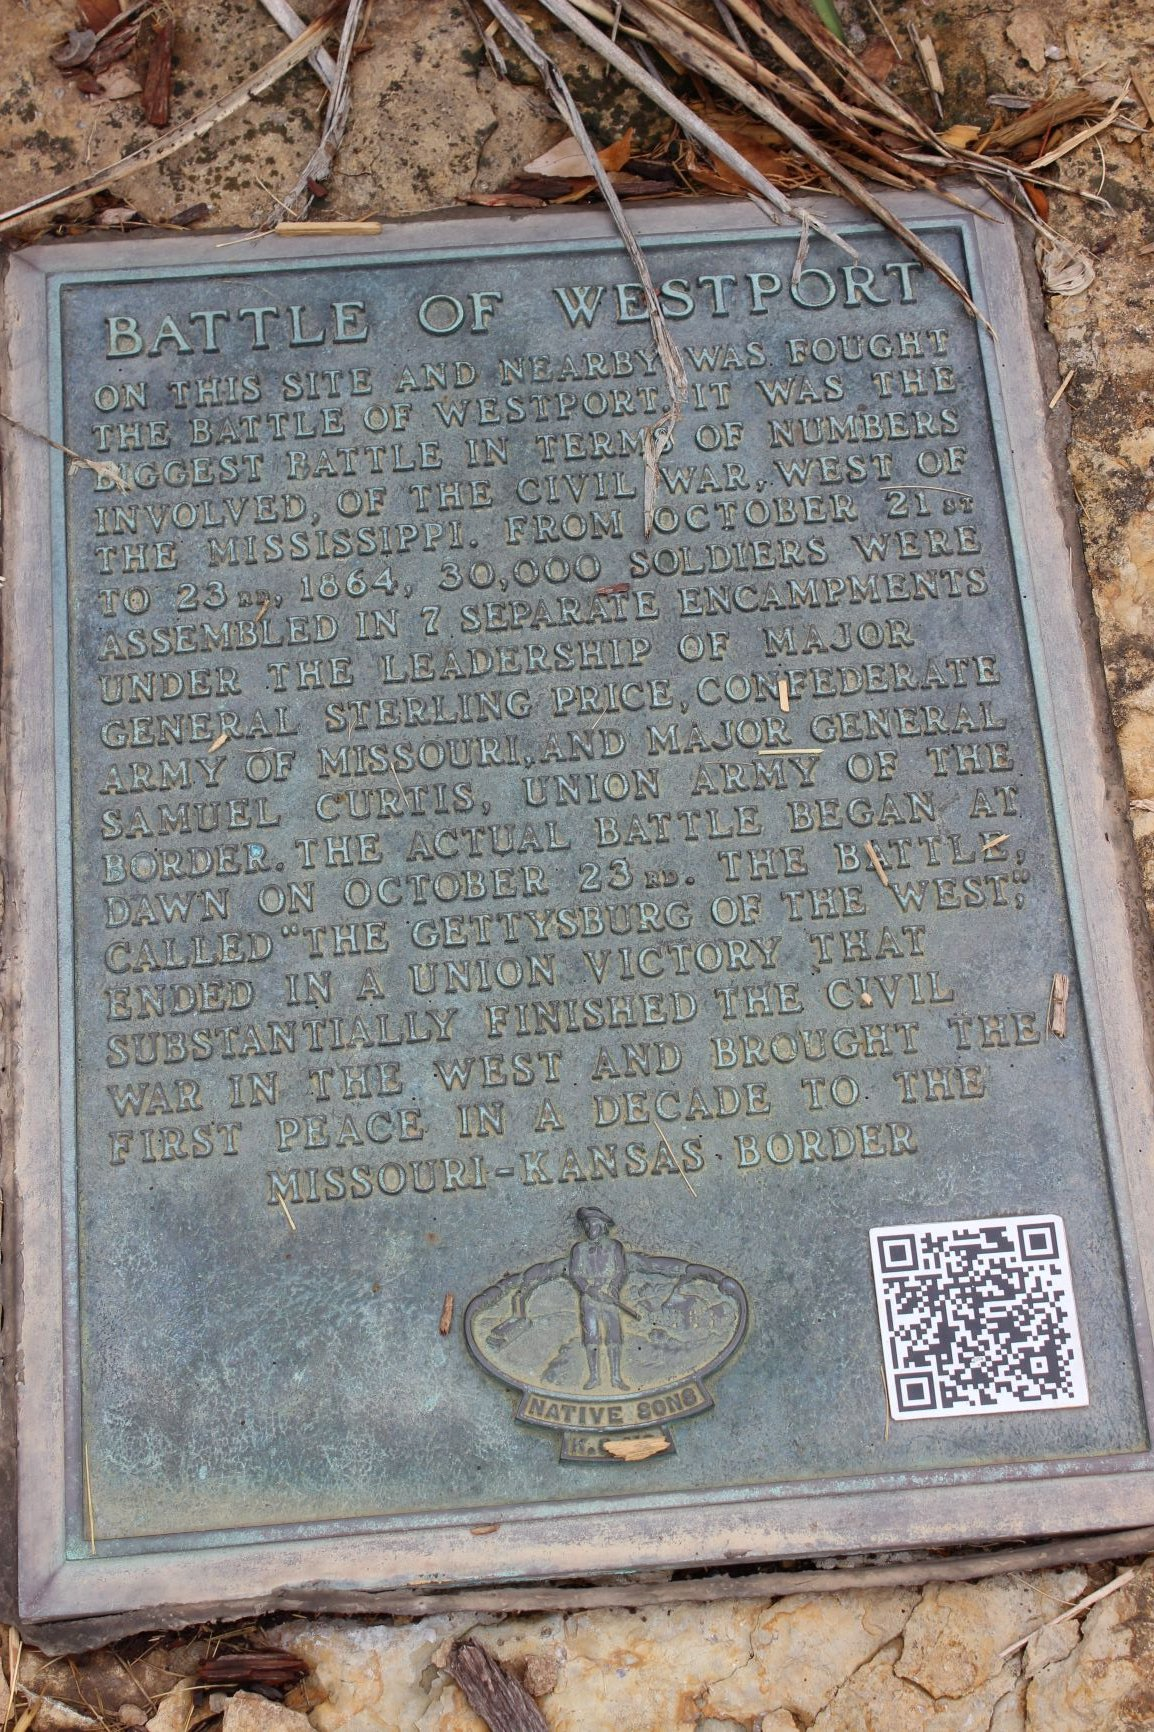 Battle of Westport interpretive plaque. Photo by Cynthia Prescott.